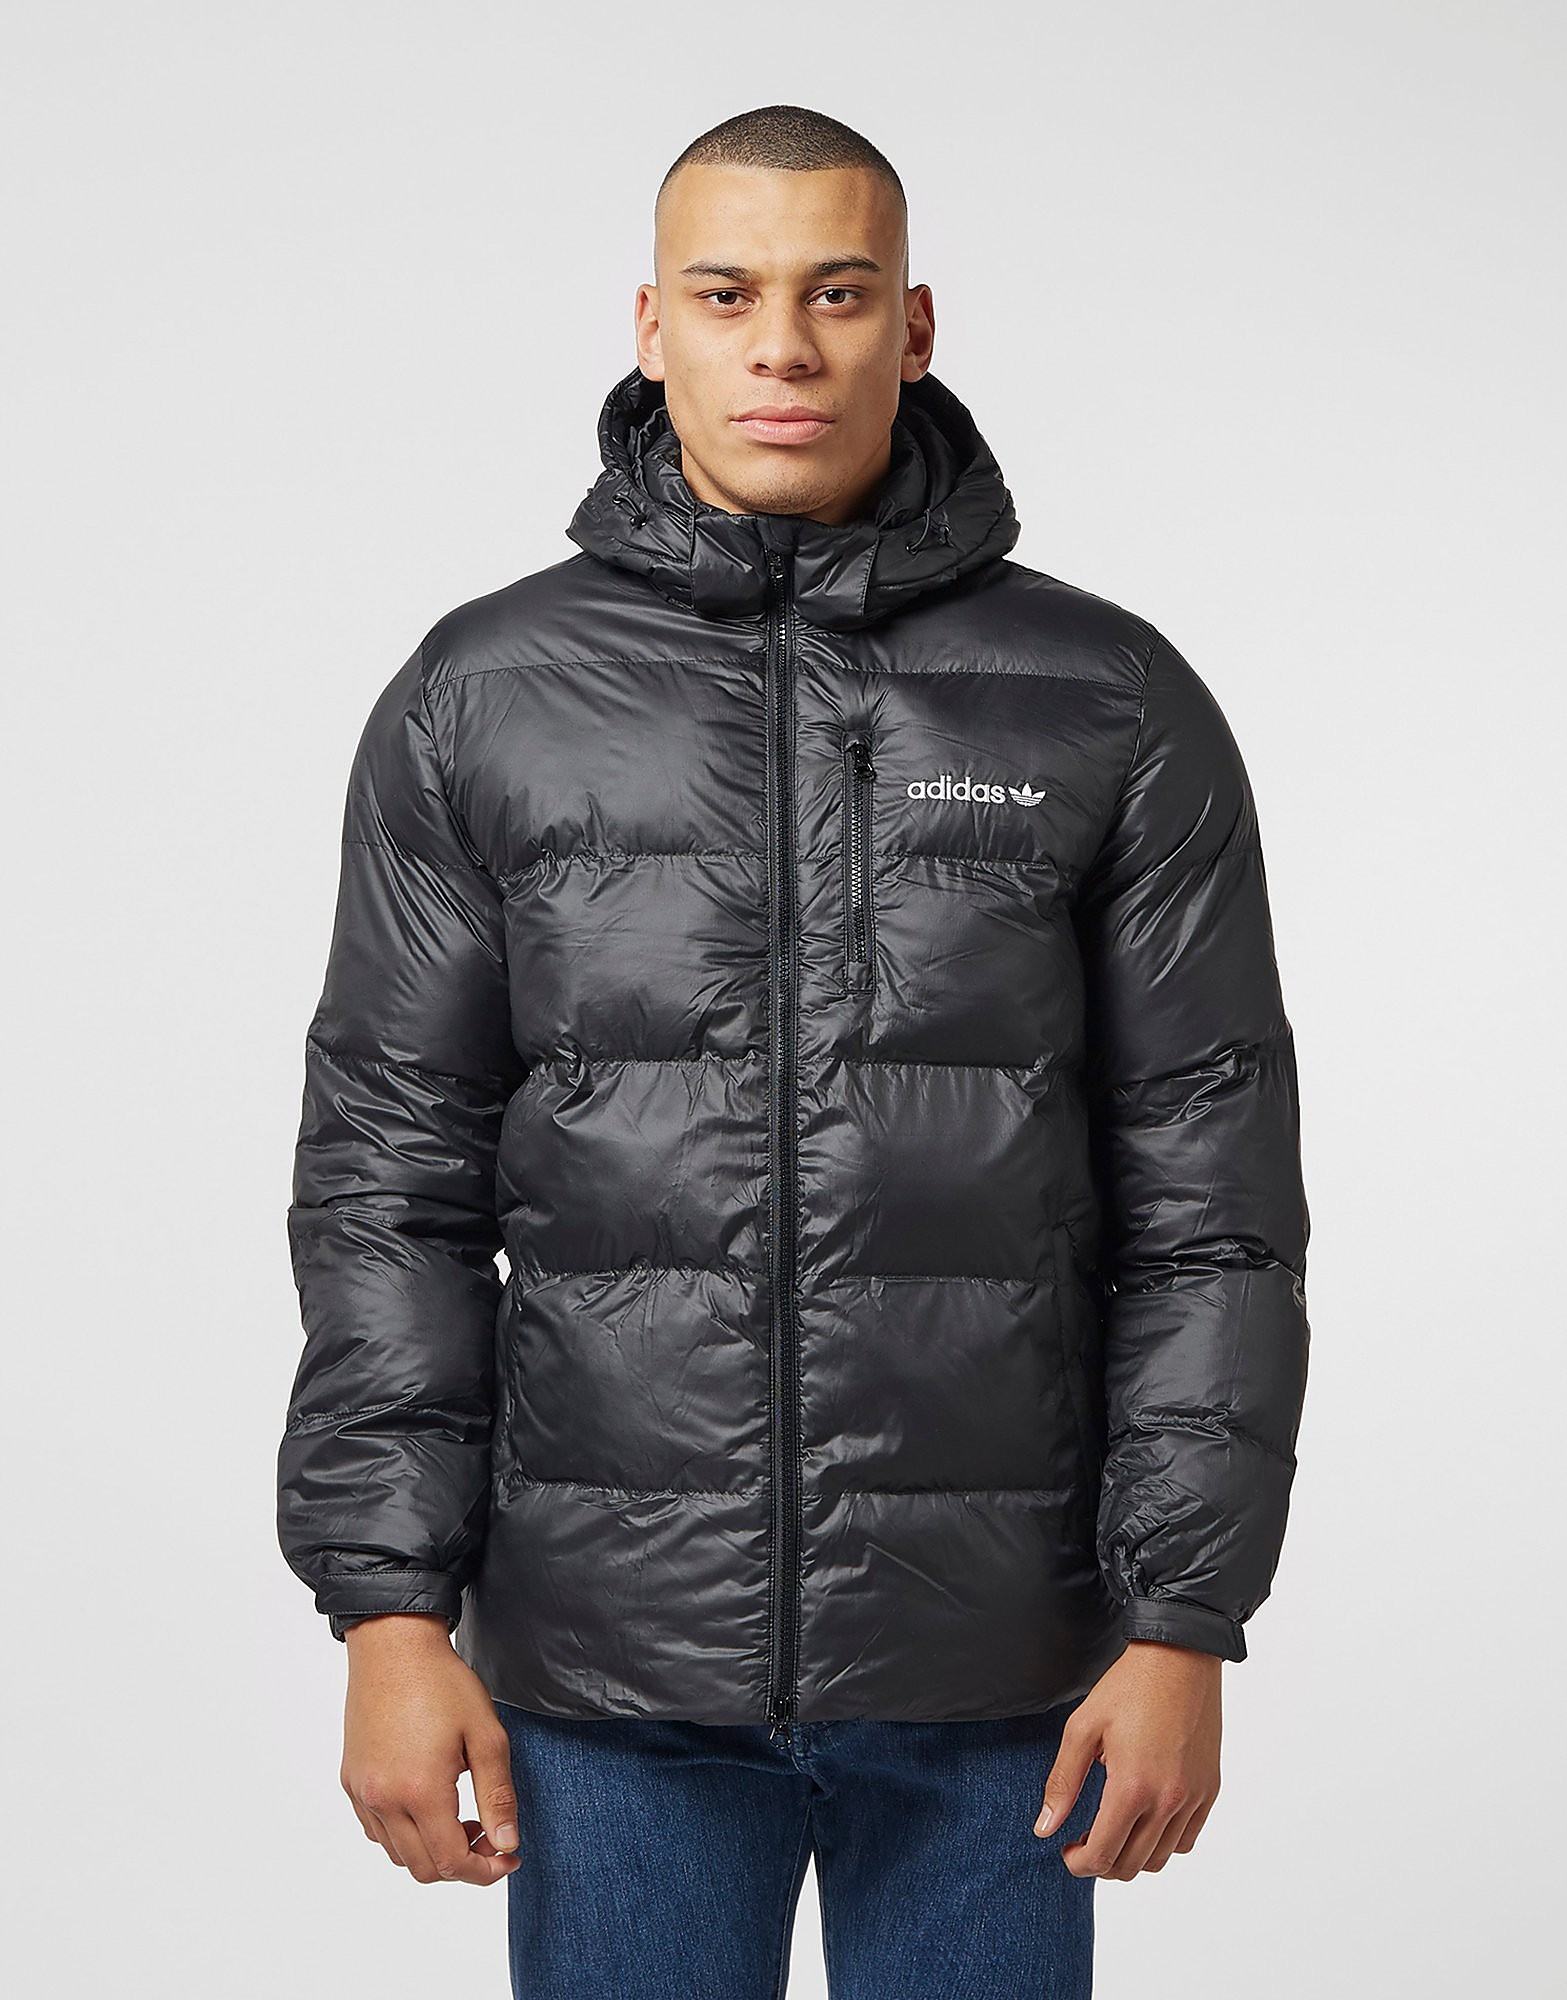 adidas Originals Hooded Down Jacket